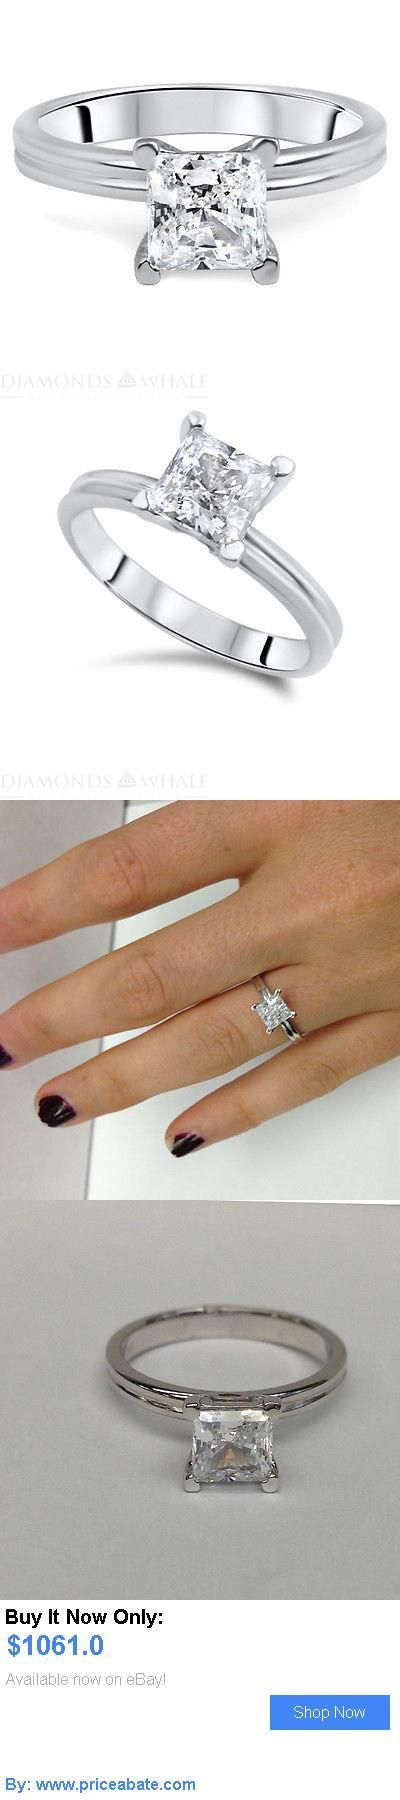 Wedding rings: 0.63 Ct Diamond Solitaire Engagement Ring Princess Cut D Si 14K White Gold BUY IT NOW ONLY: $1061.0 #priceabateWeddingrings OR #priceabate